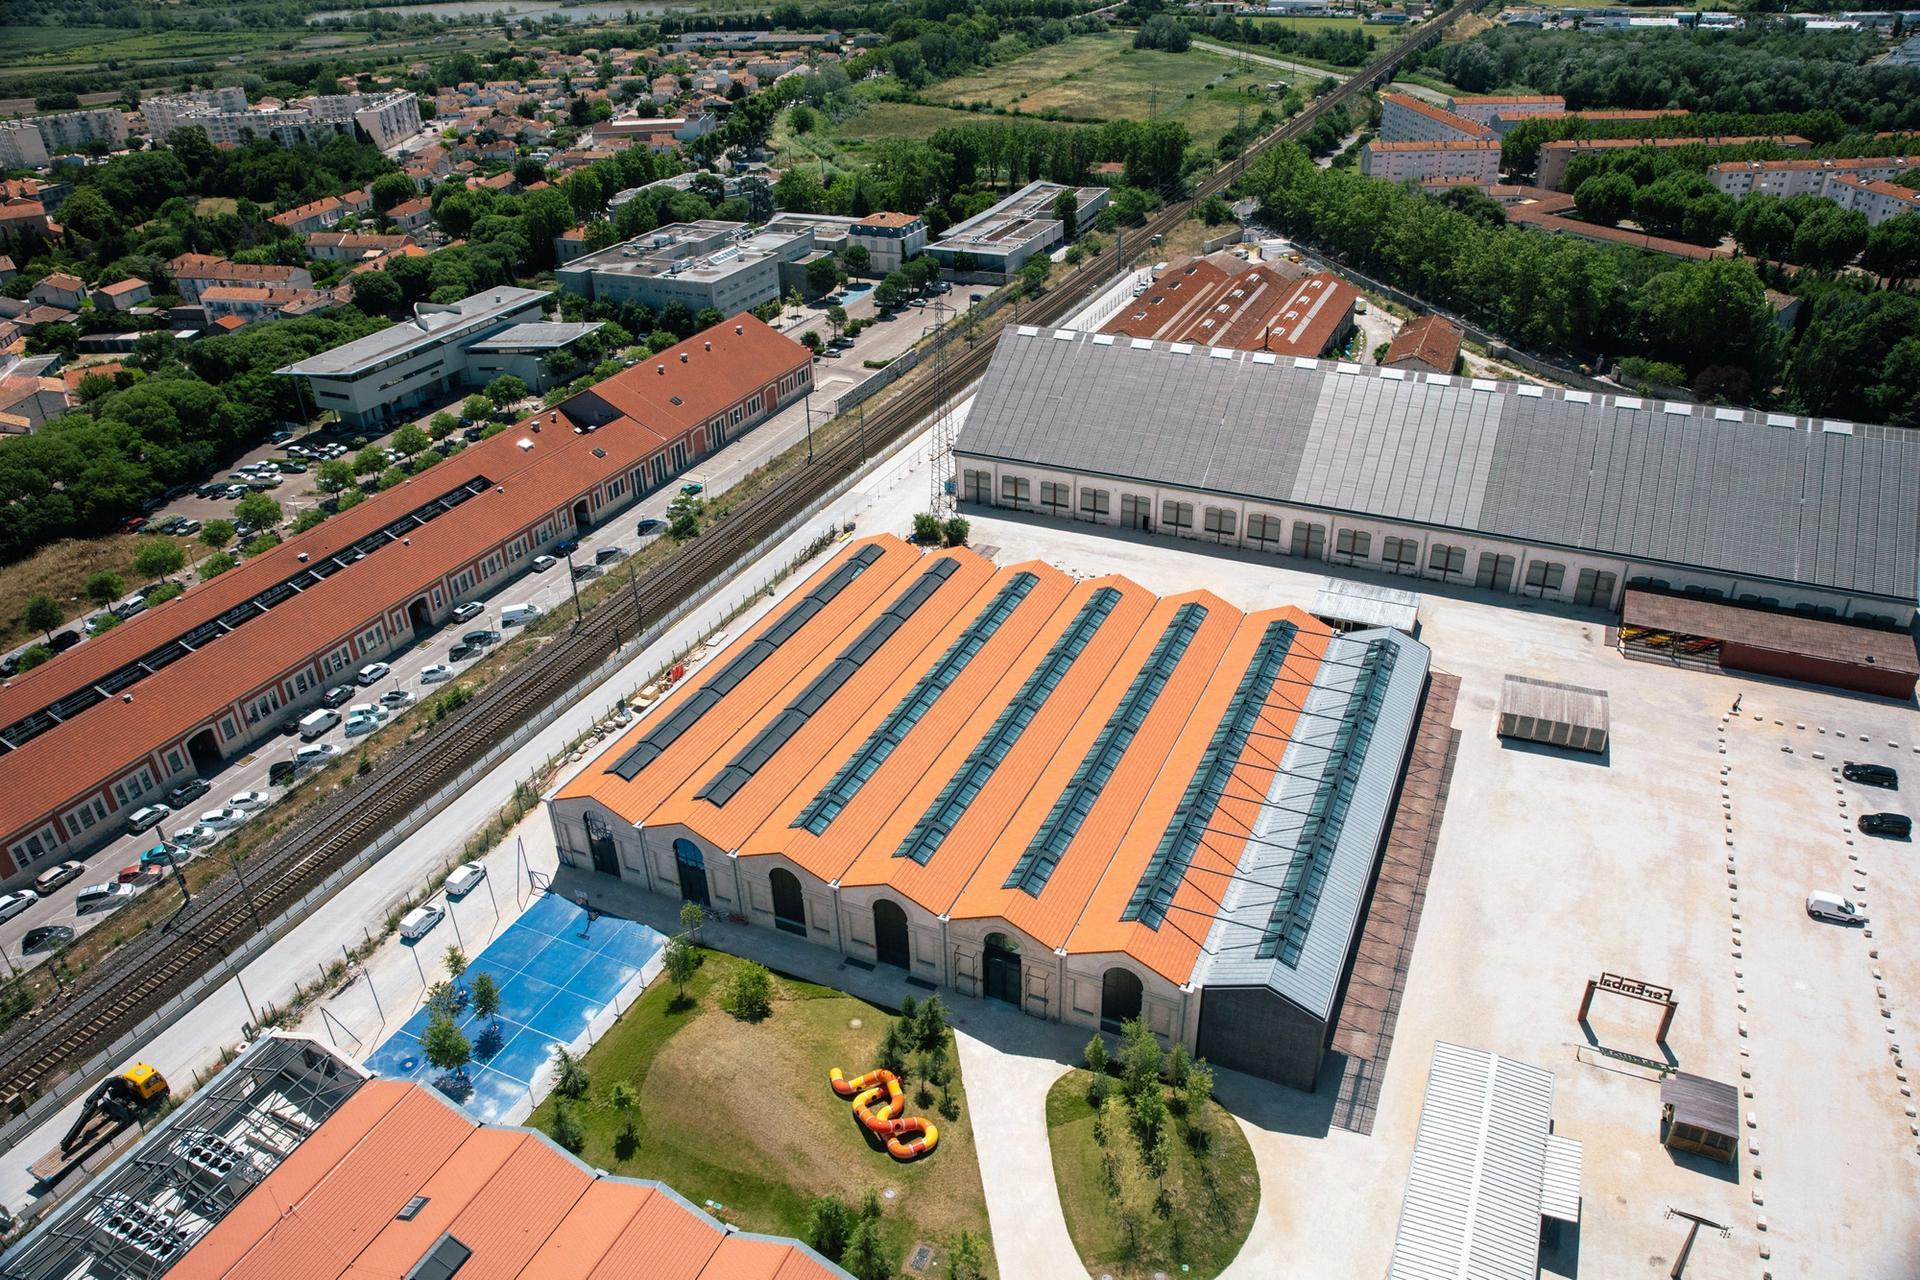 Aerial view of Luma Arles Parc des Ateliers site, June 2017 © Victor Picon